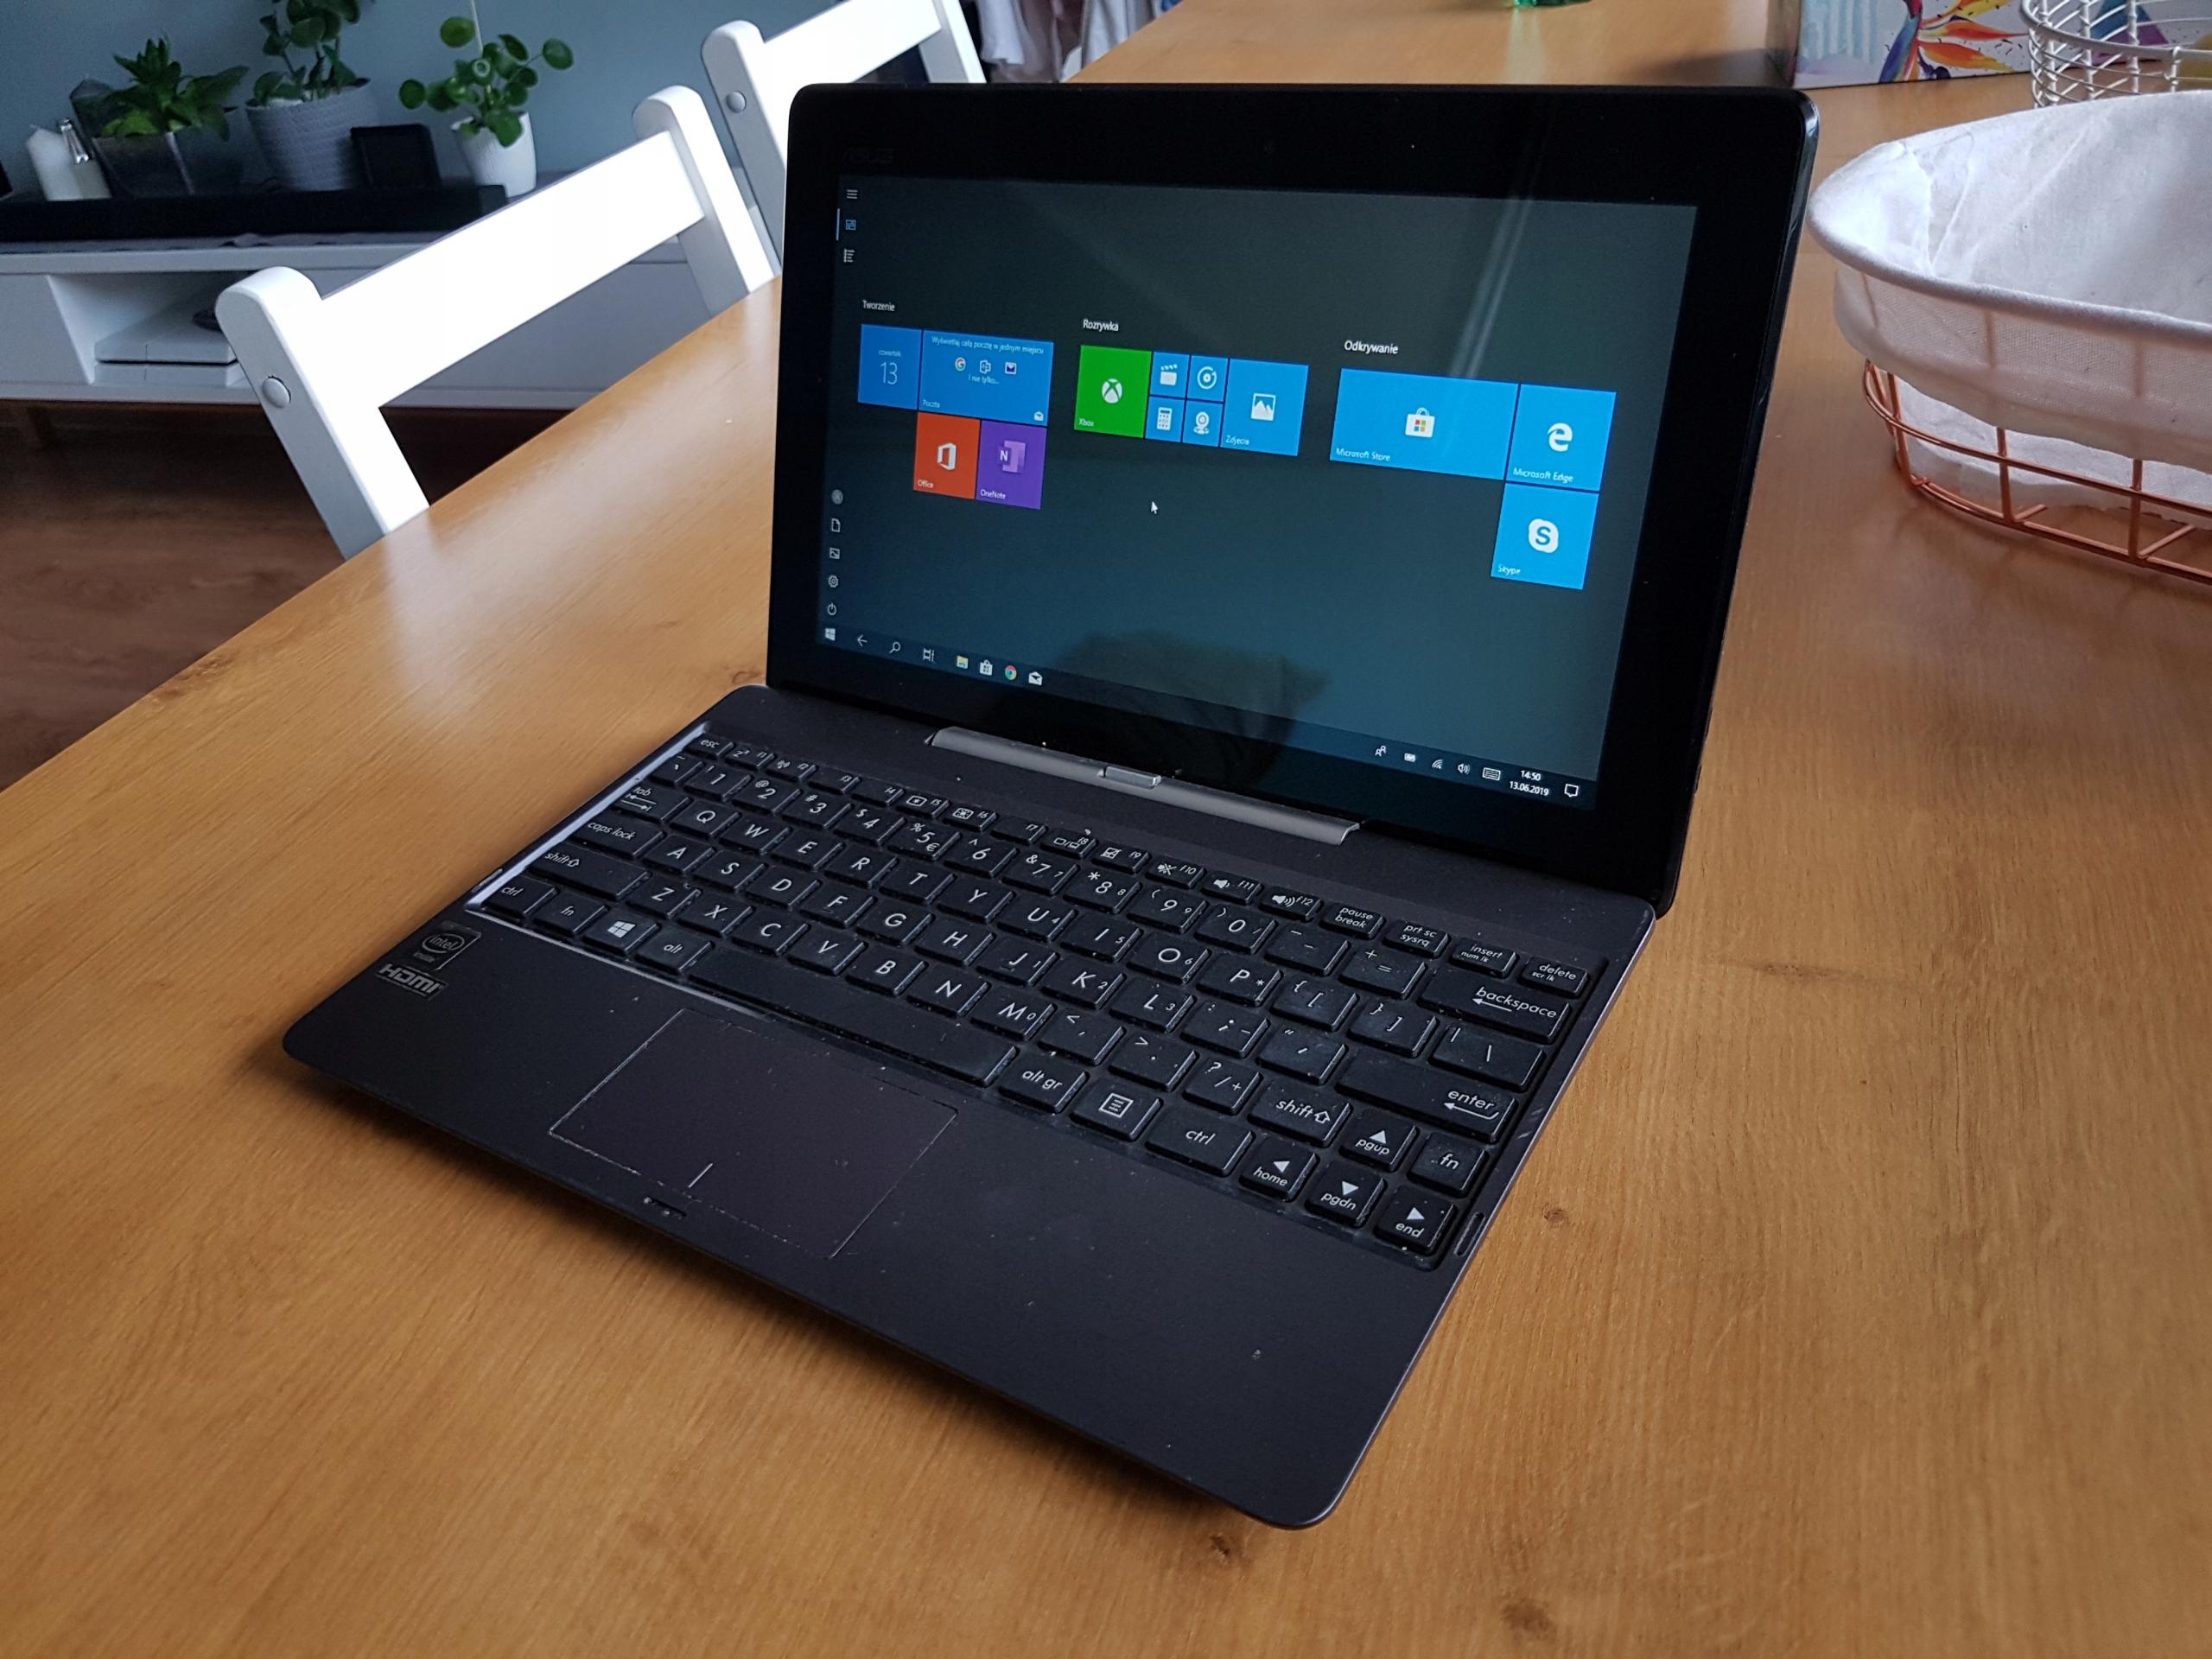 Laptop Asus Transformer 2 w 1 - laptop i tablet